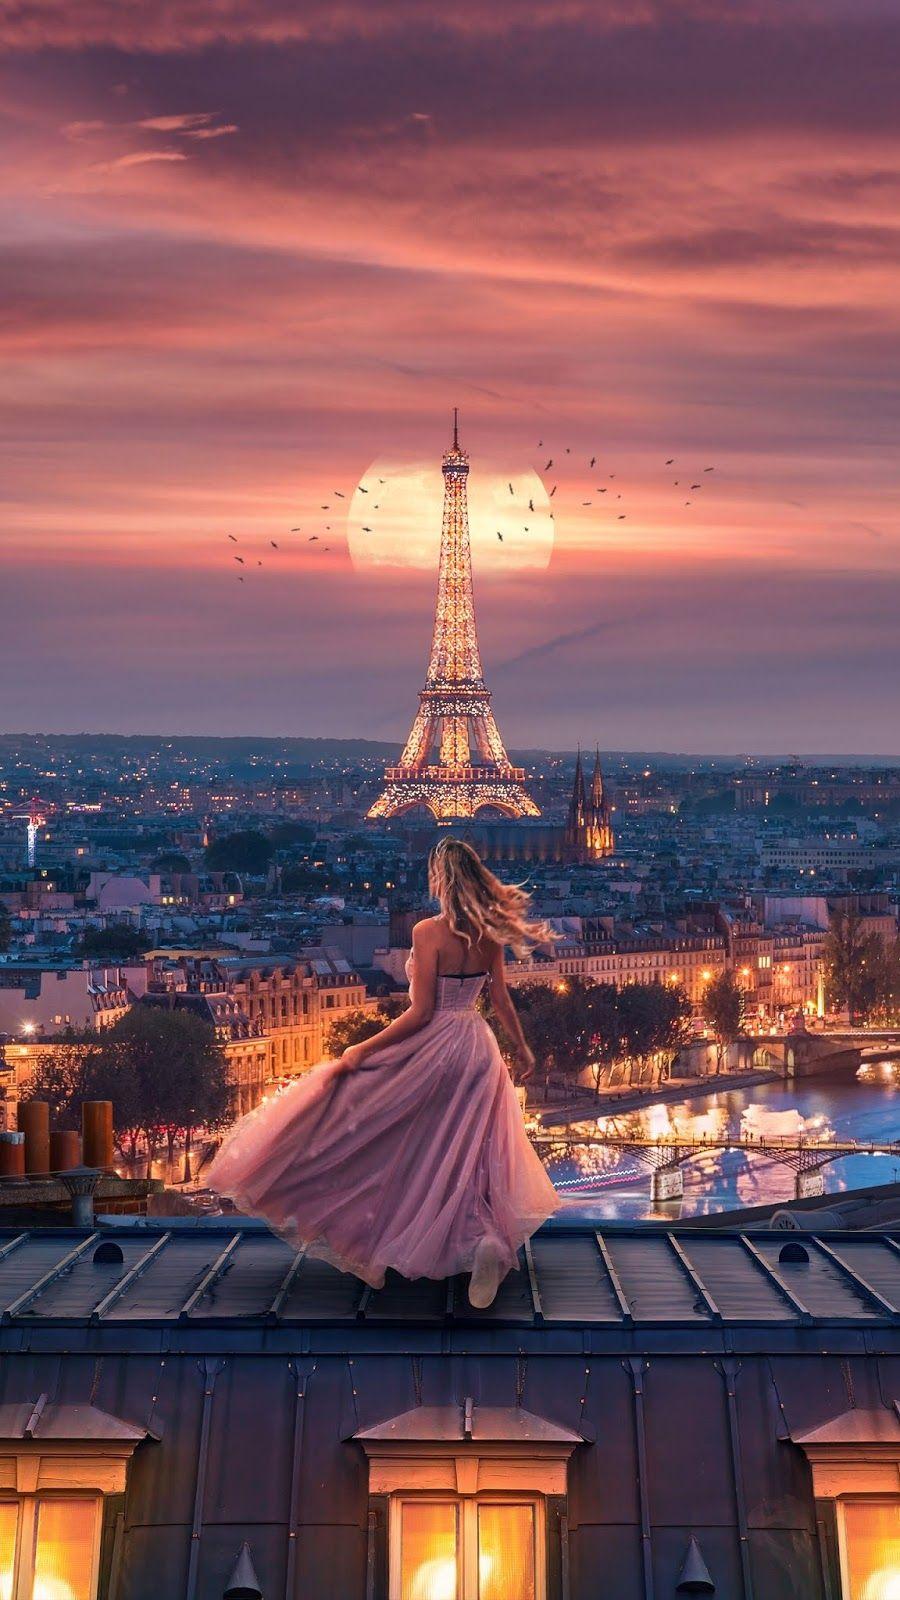 Moonlight Over Paris Mobile Wallpaper Paris Photography Eiffel Tower Paris Wallpaper Iphone Eiffel Tower Photography